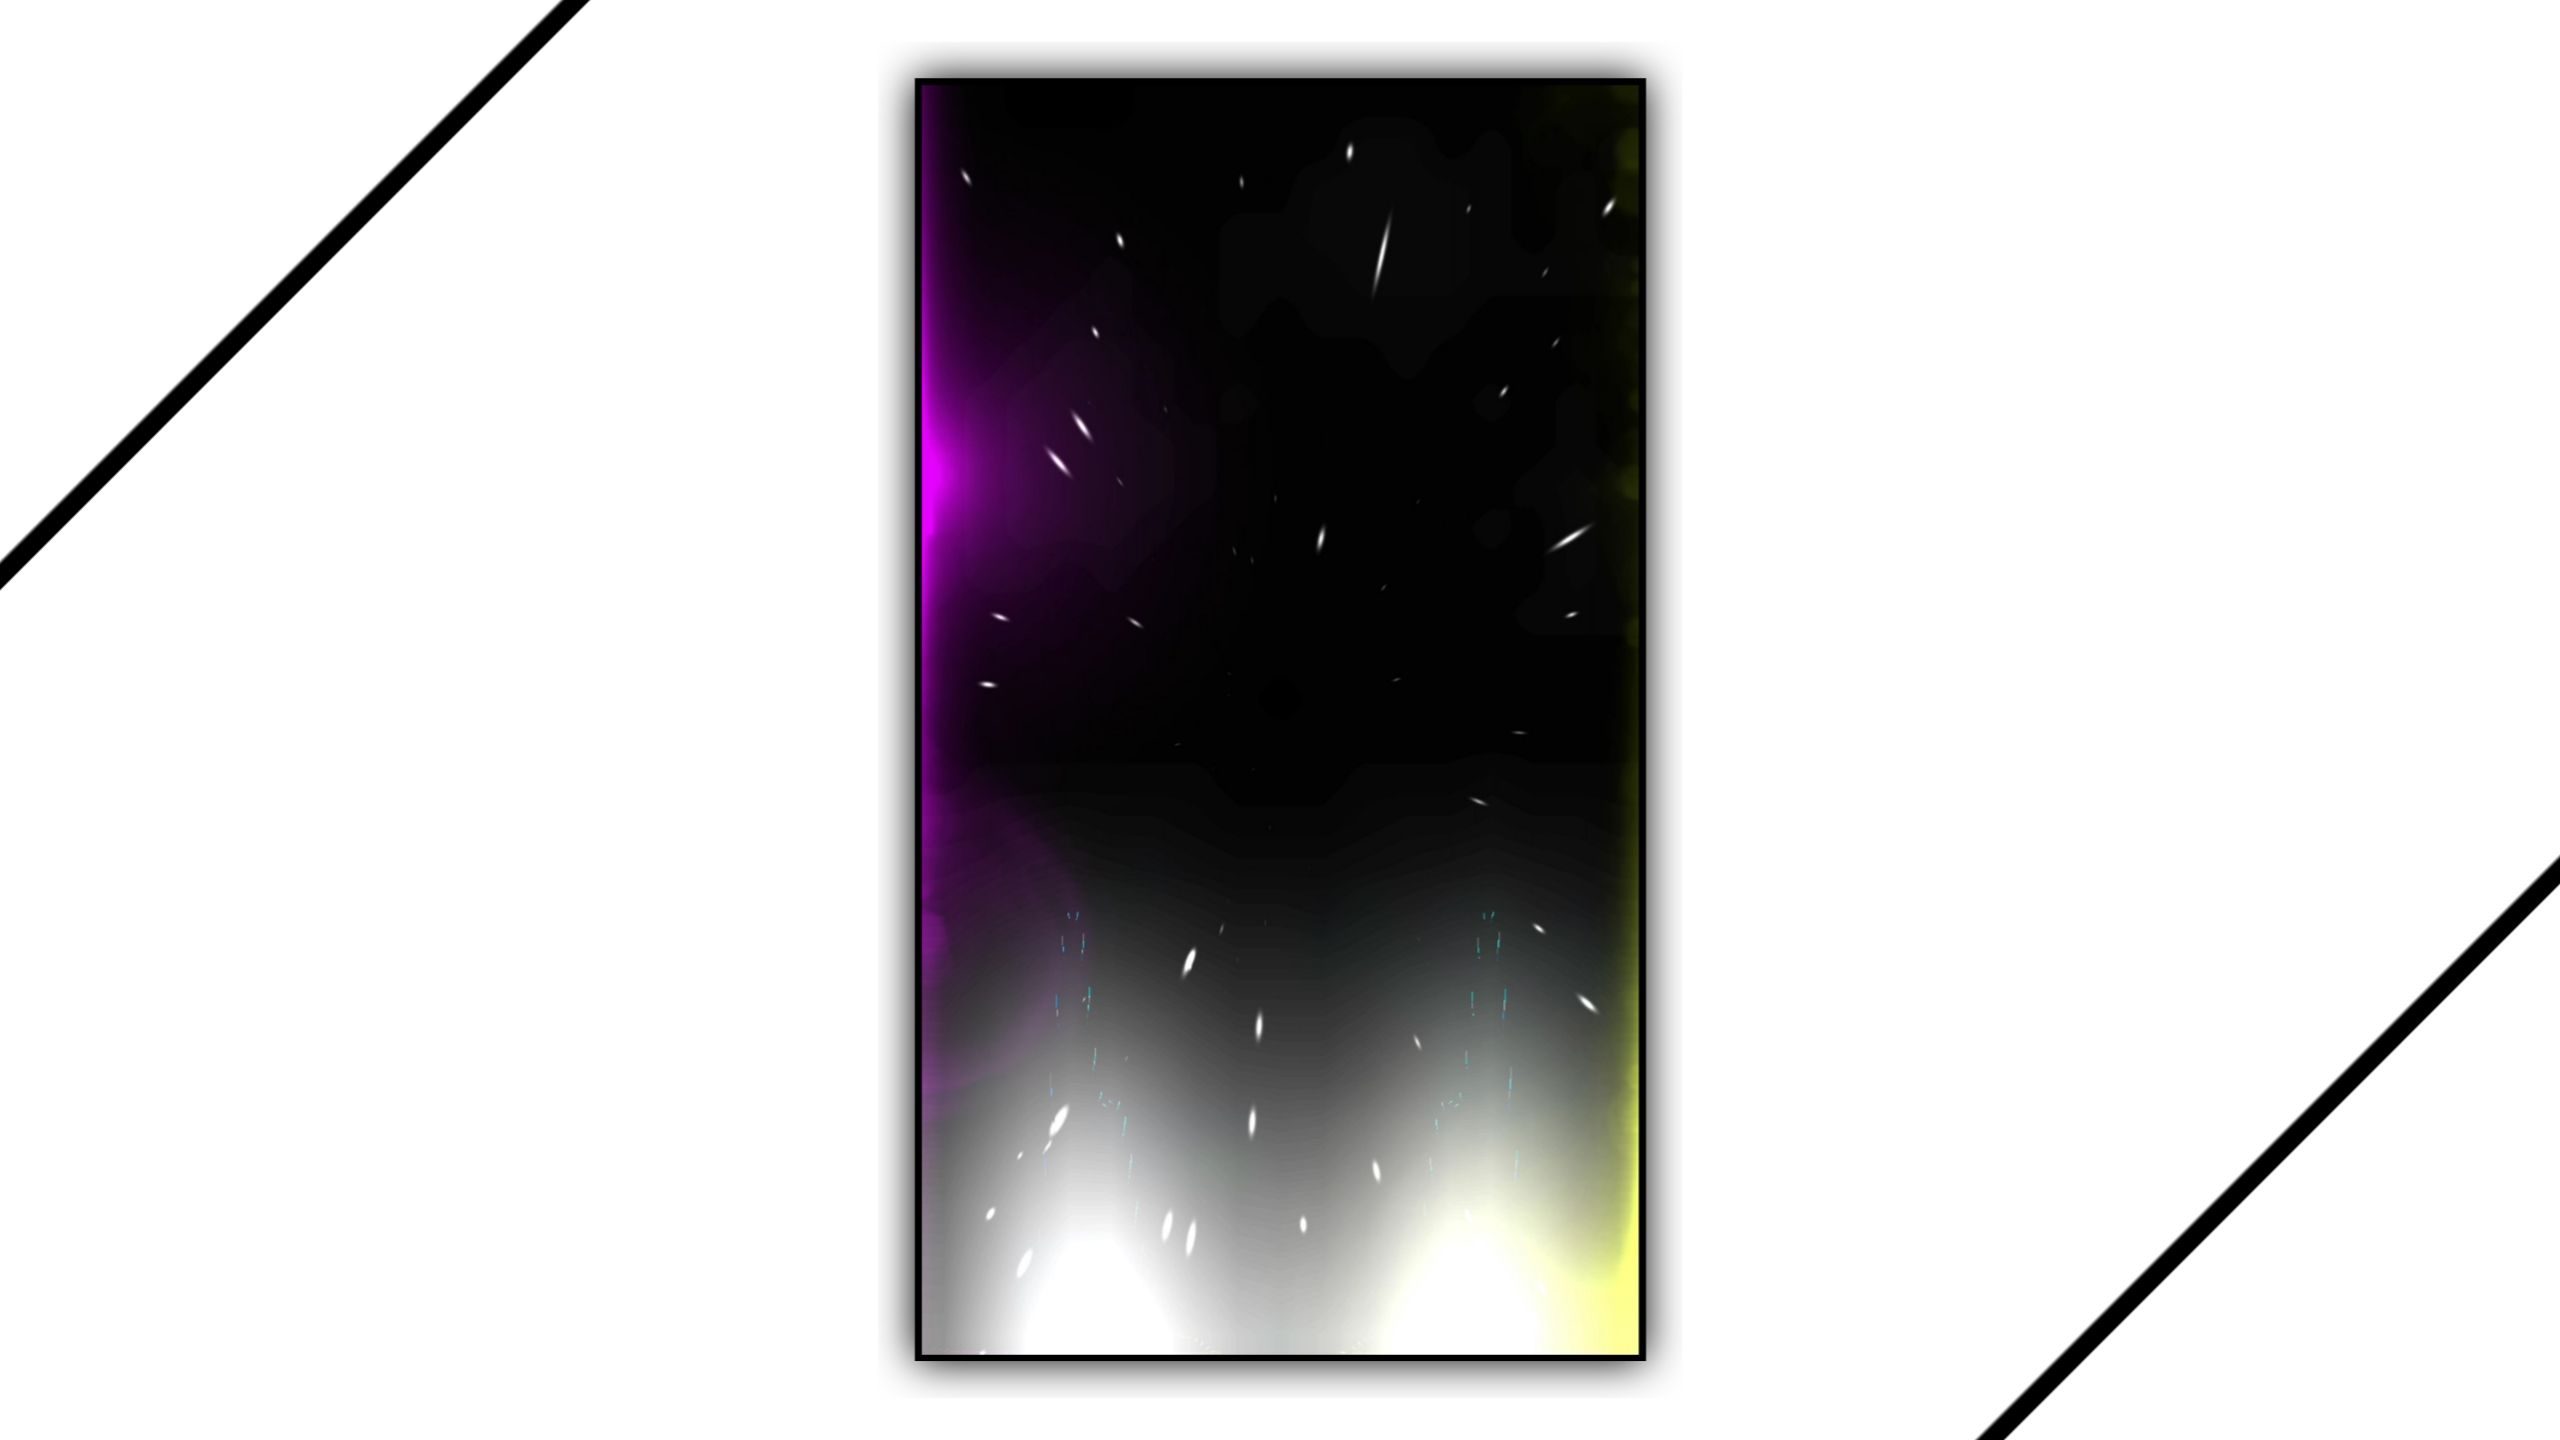 High Frequency Light Drop Effect Full HD